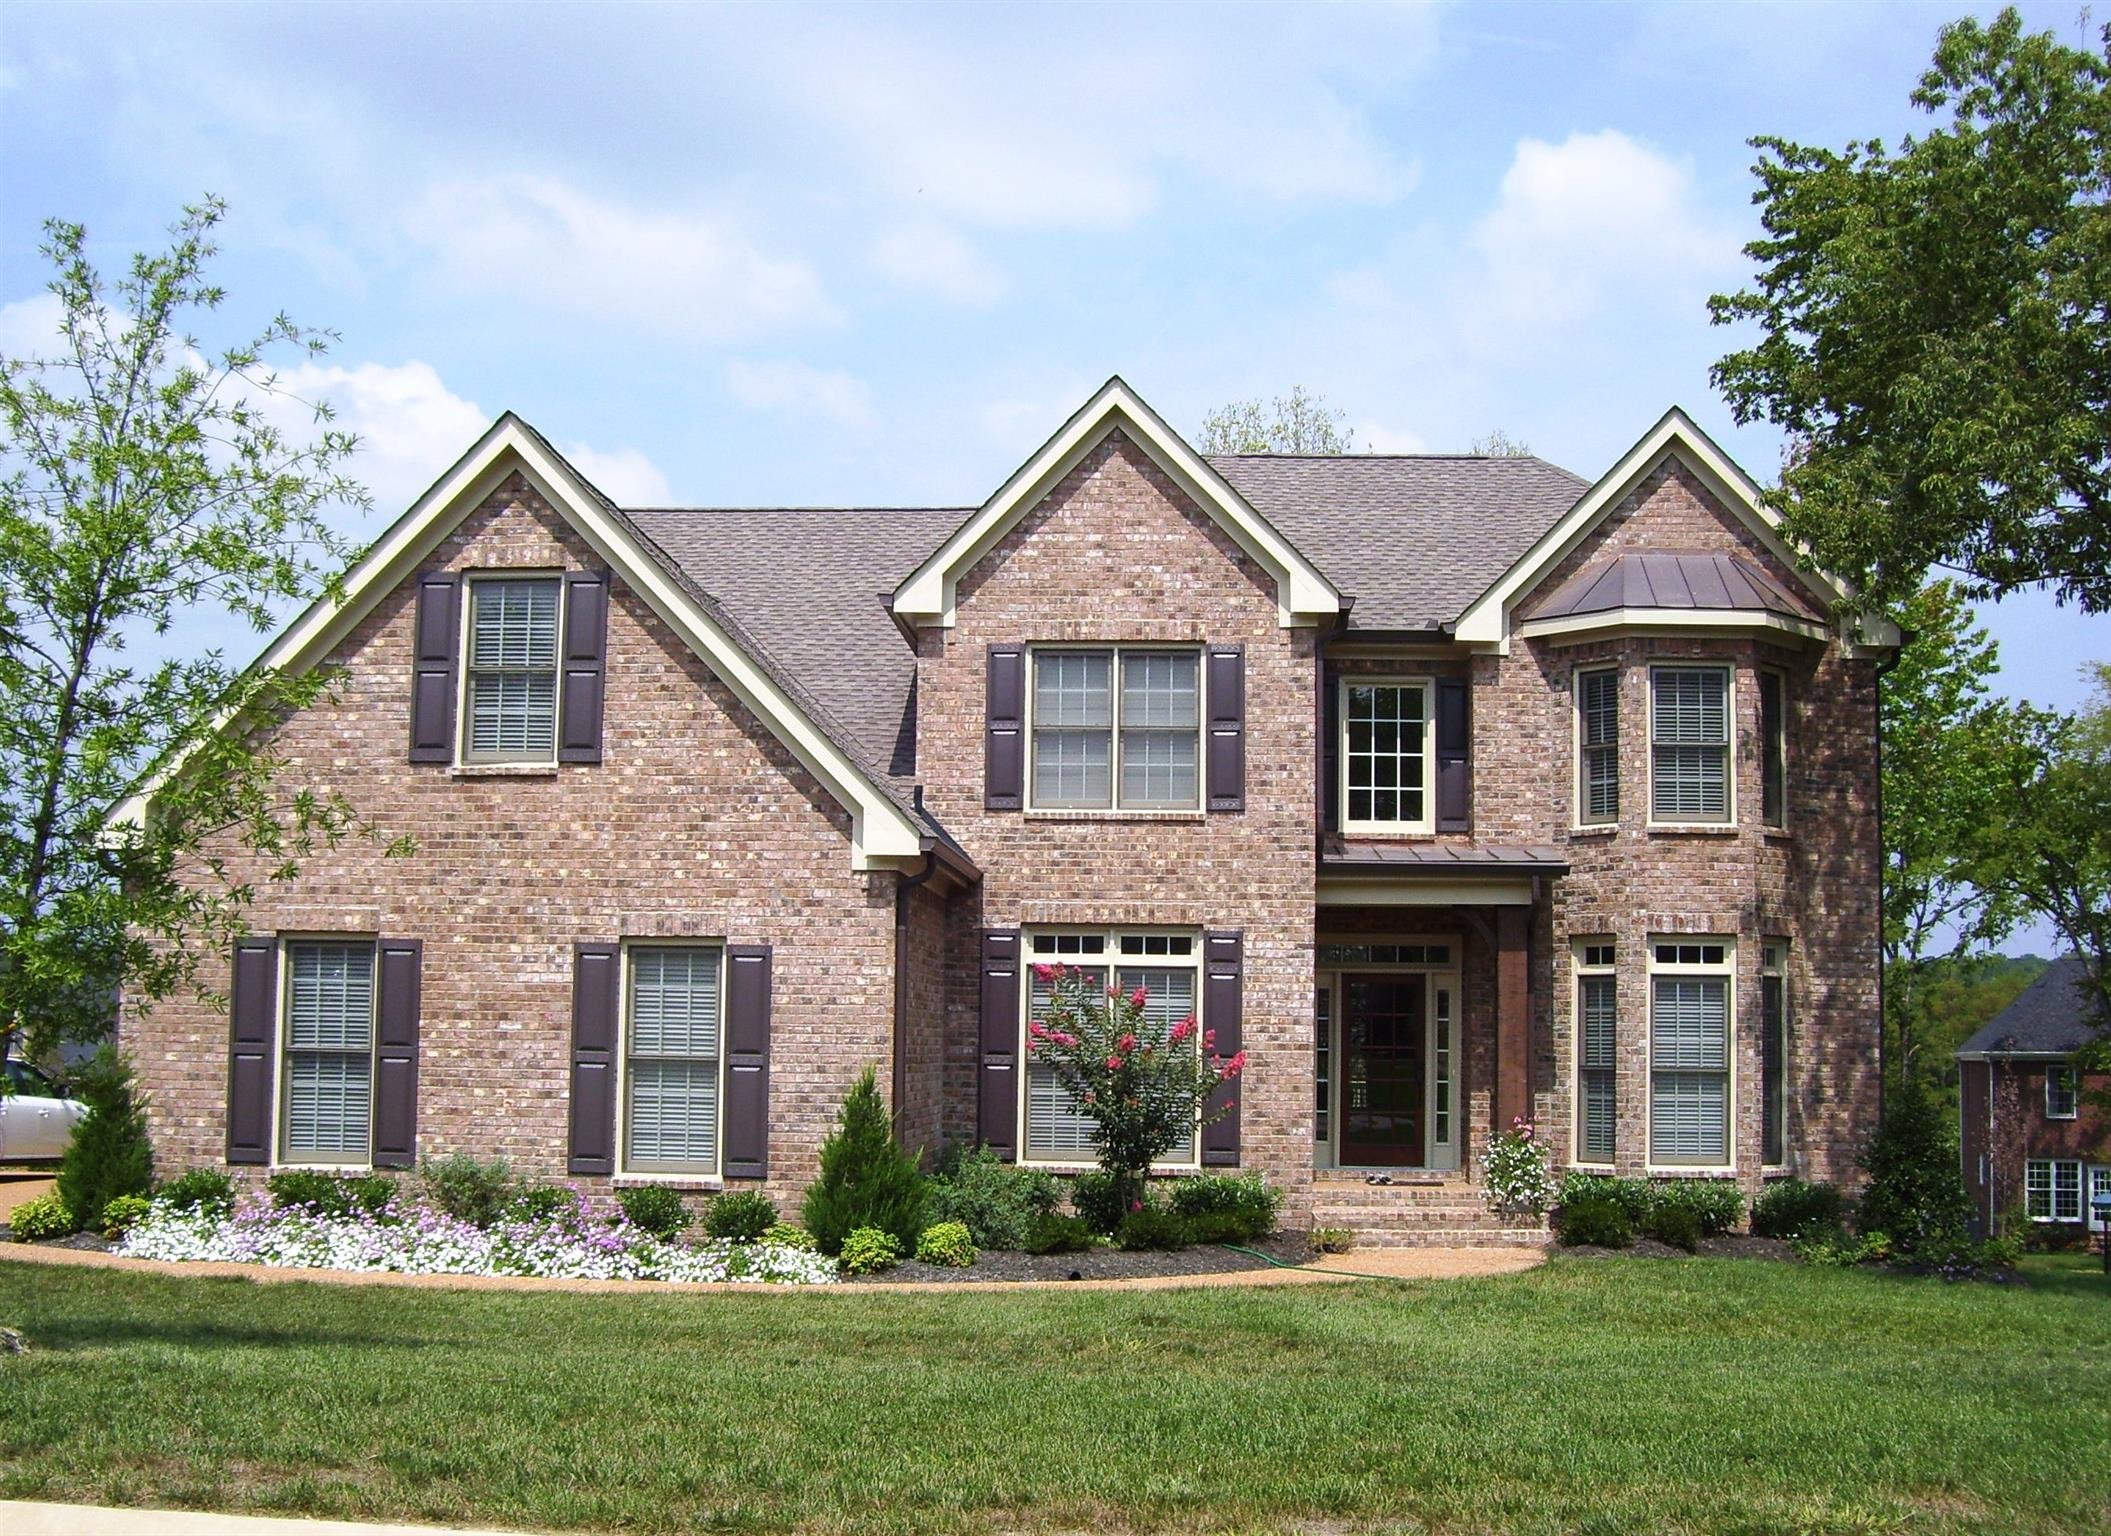 312 Bayberry Court/ Lot 529, Nolensville, TN 37135 - Nolensville, TN real estate listing